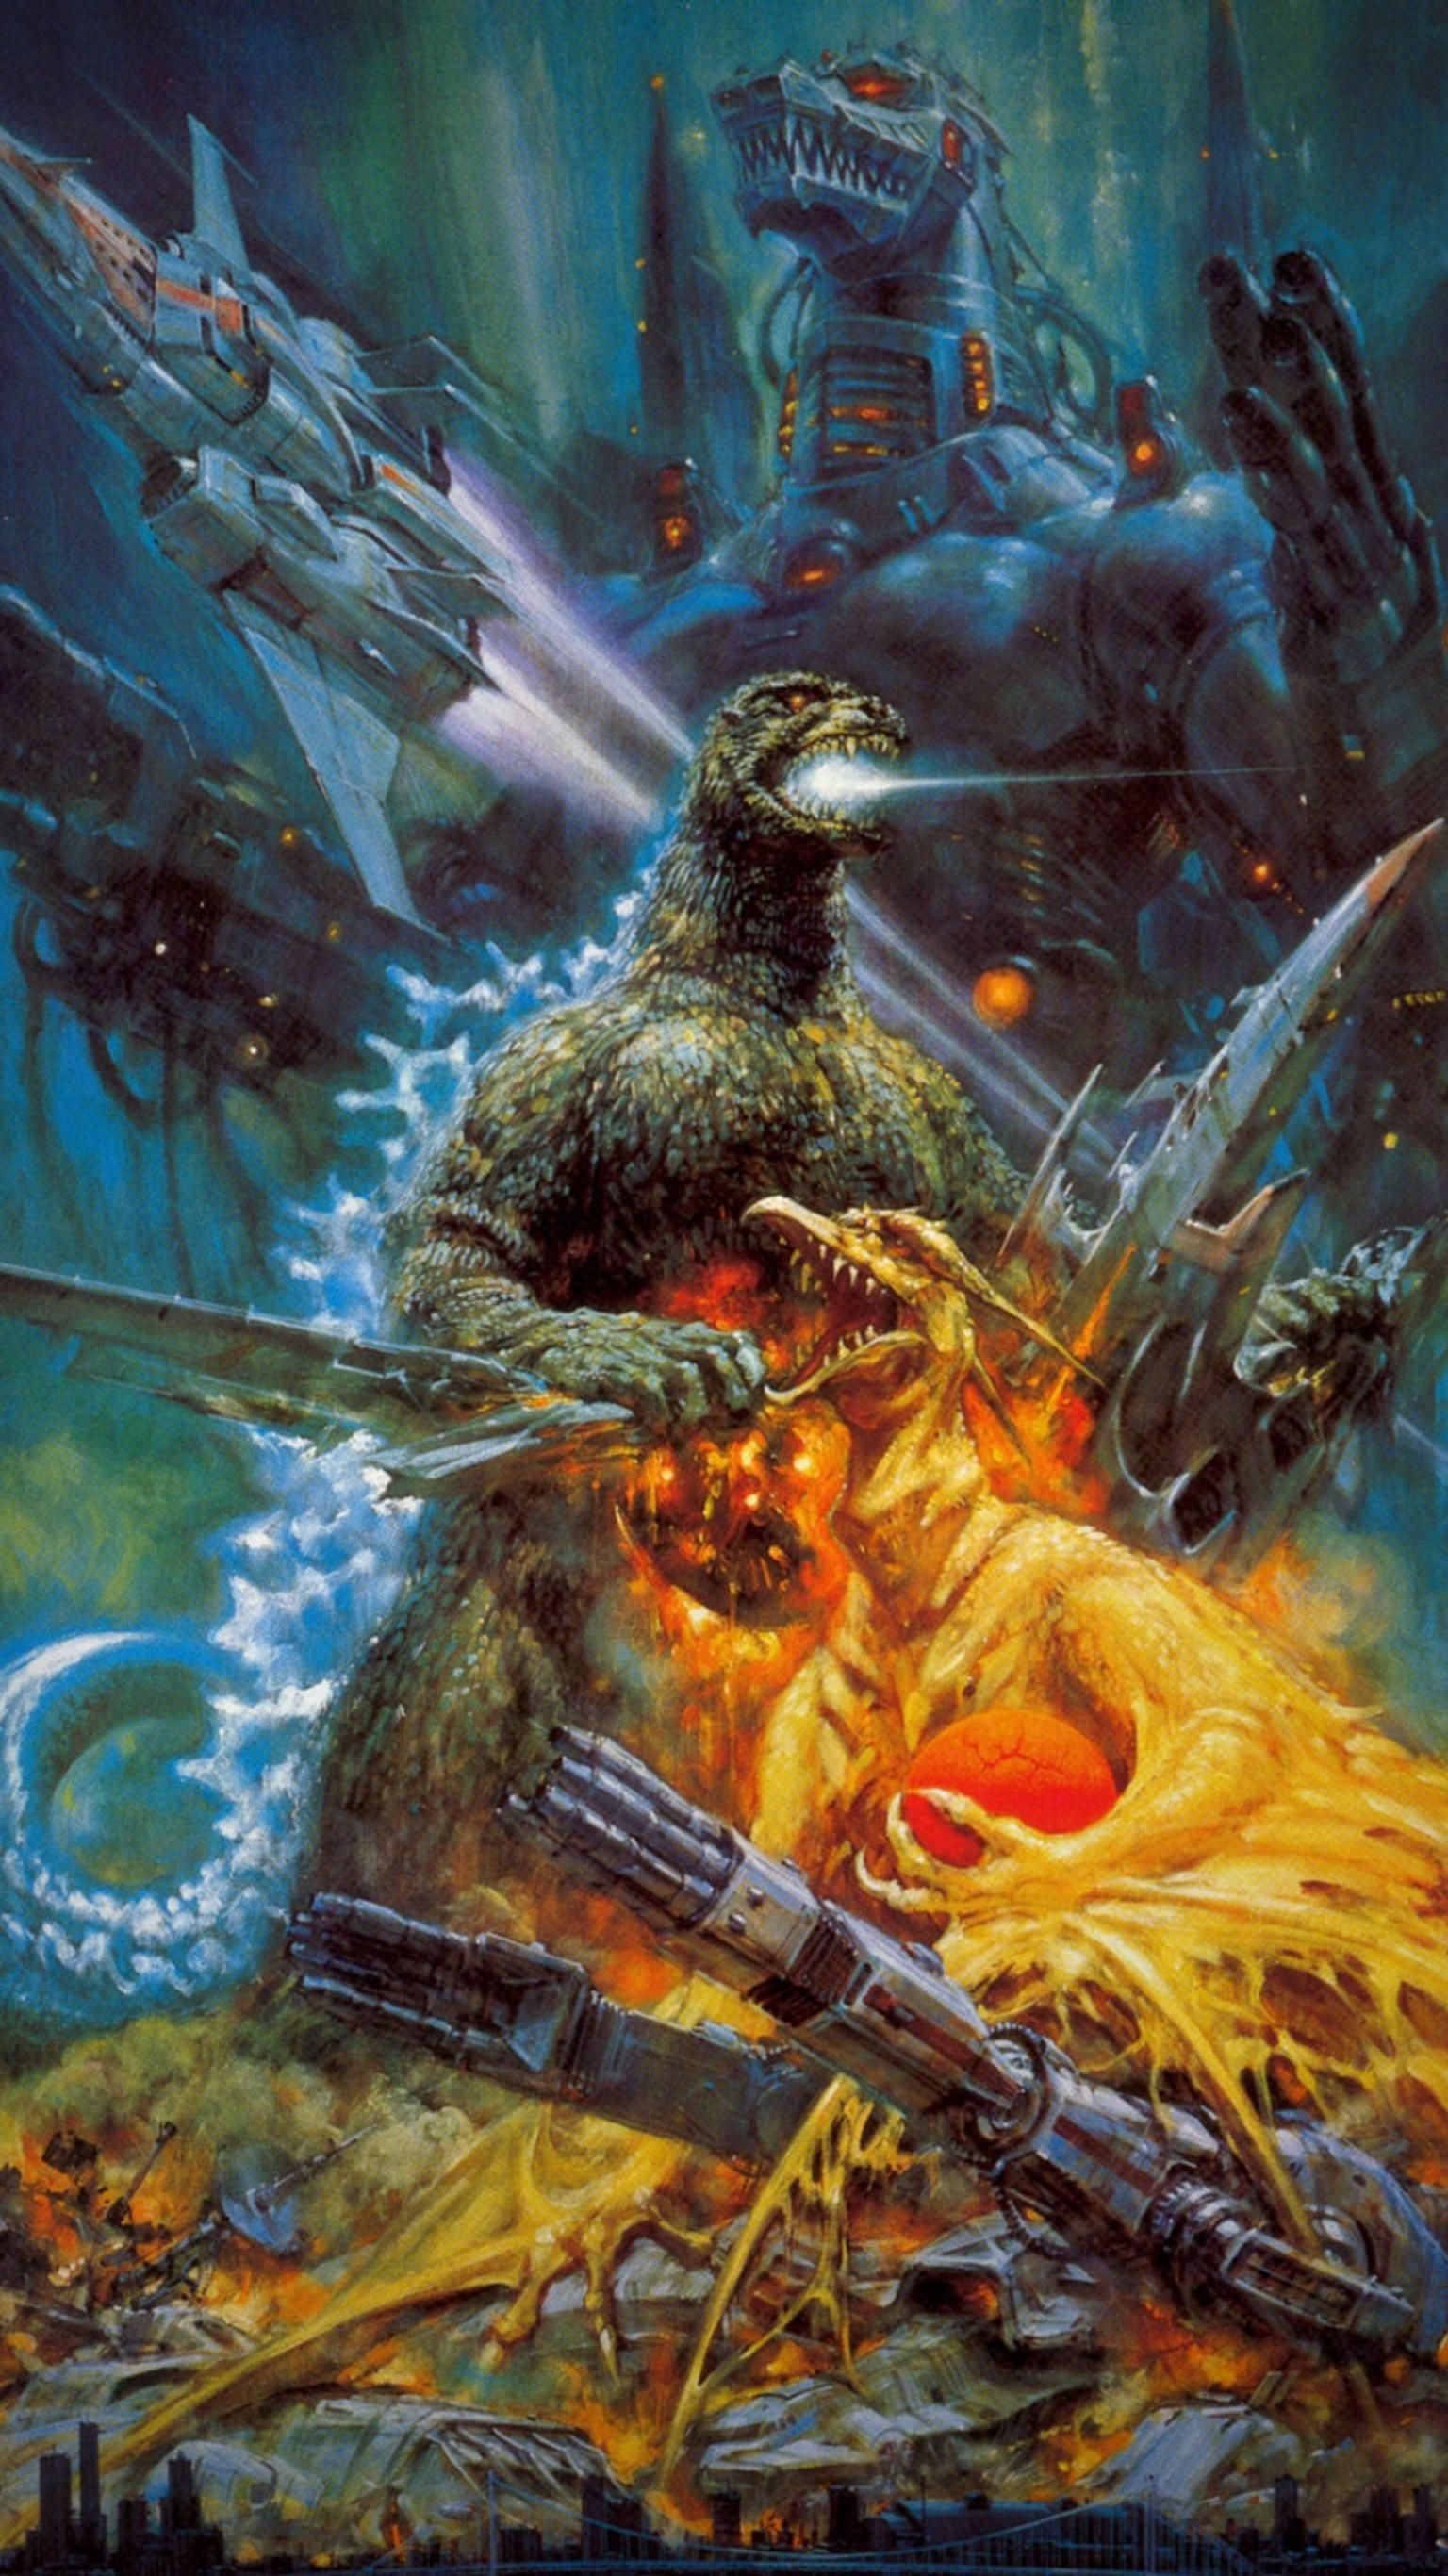 Godzilla vs. Mechagodzilla II (1993) Phone Wallpaper AC